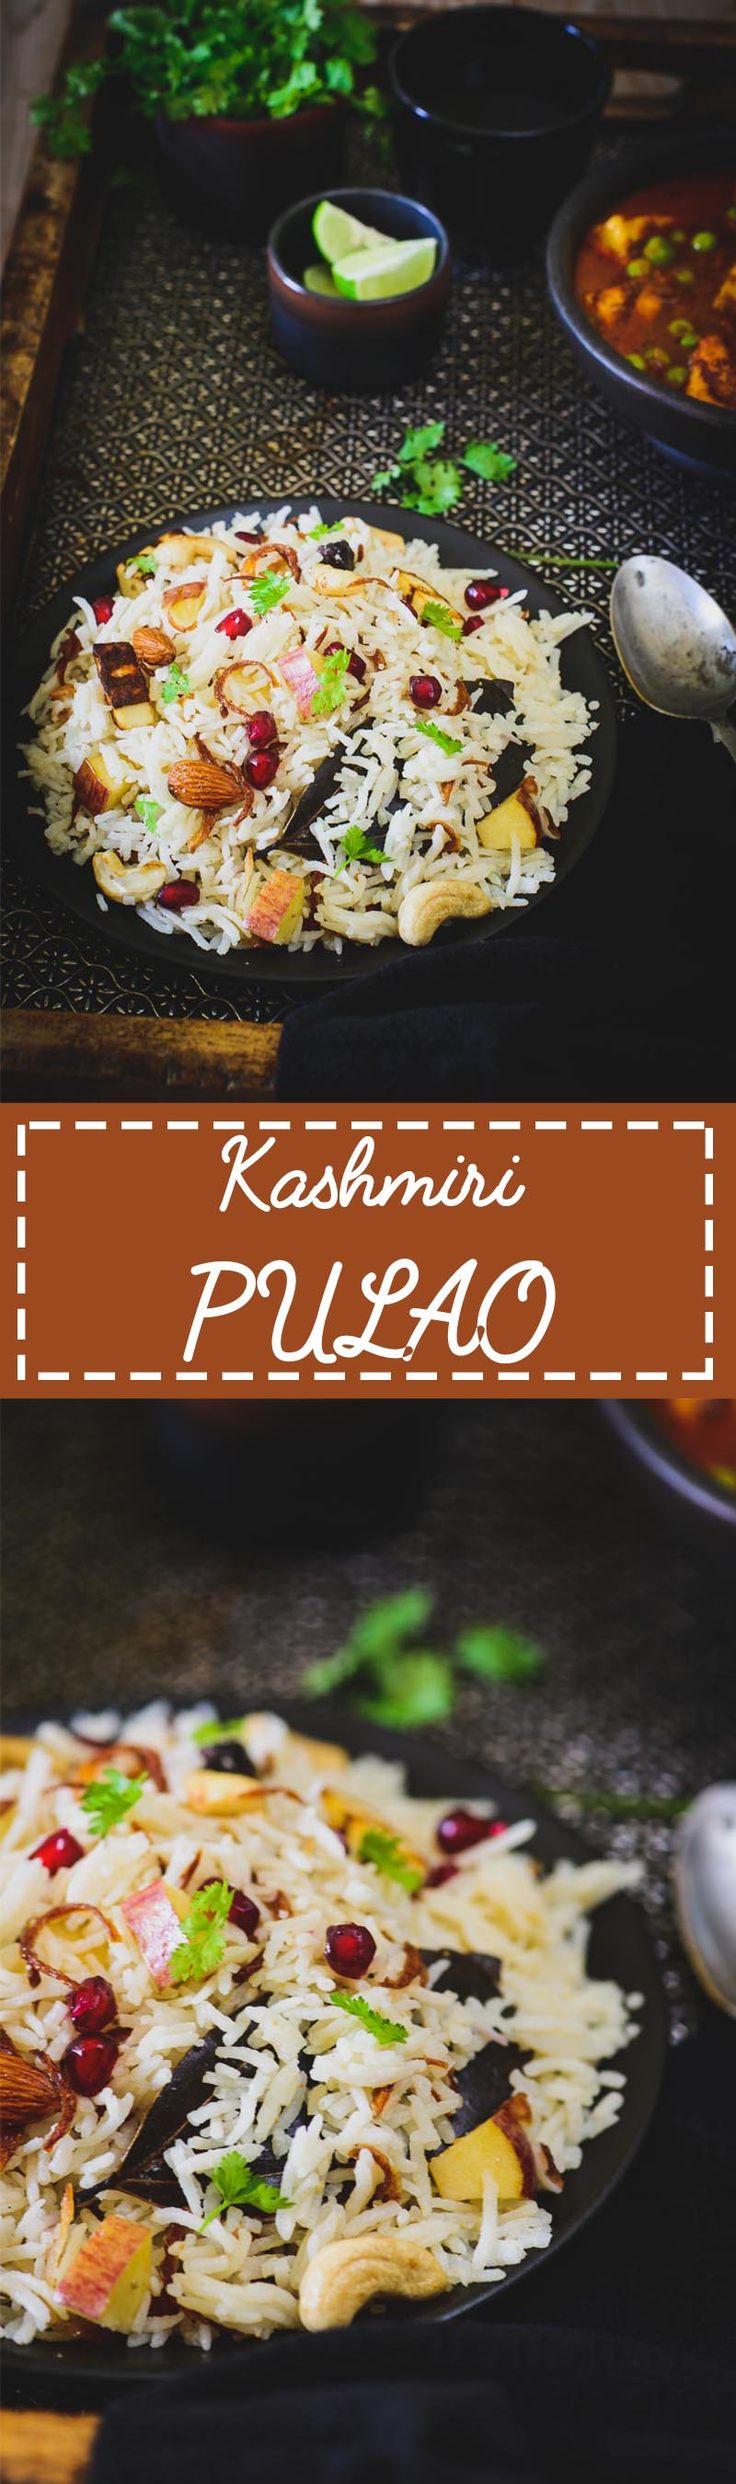 12 best traditional kashmiri recipes images on pinterest kashmiri kashmiri pulao forumfinder Gallery